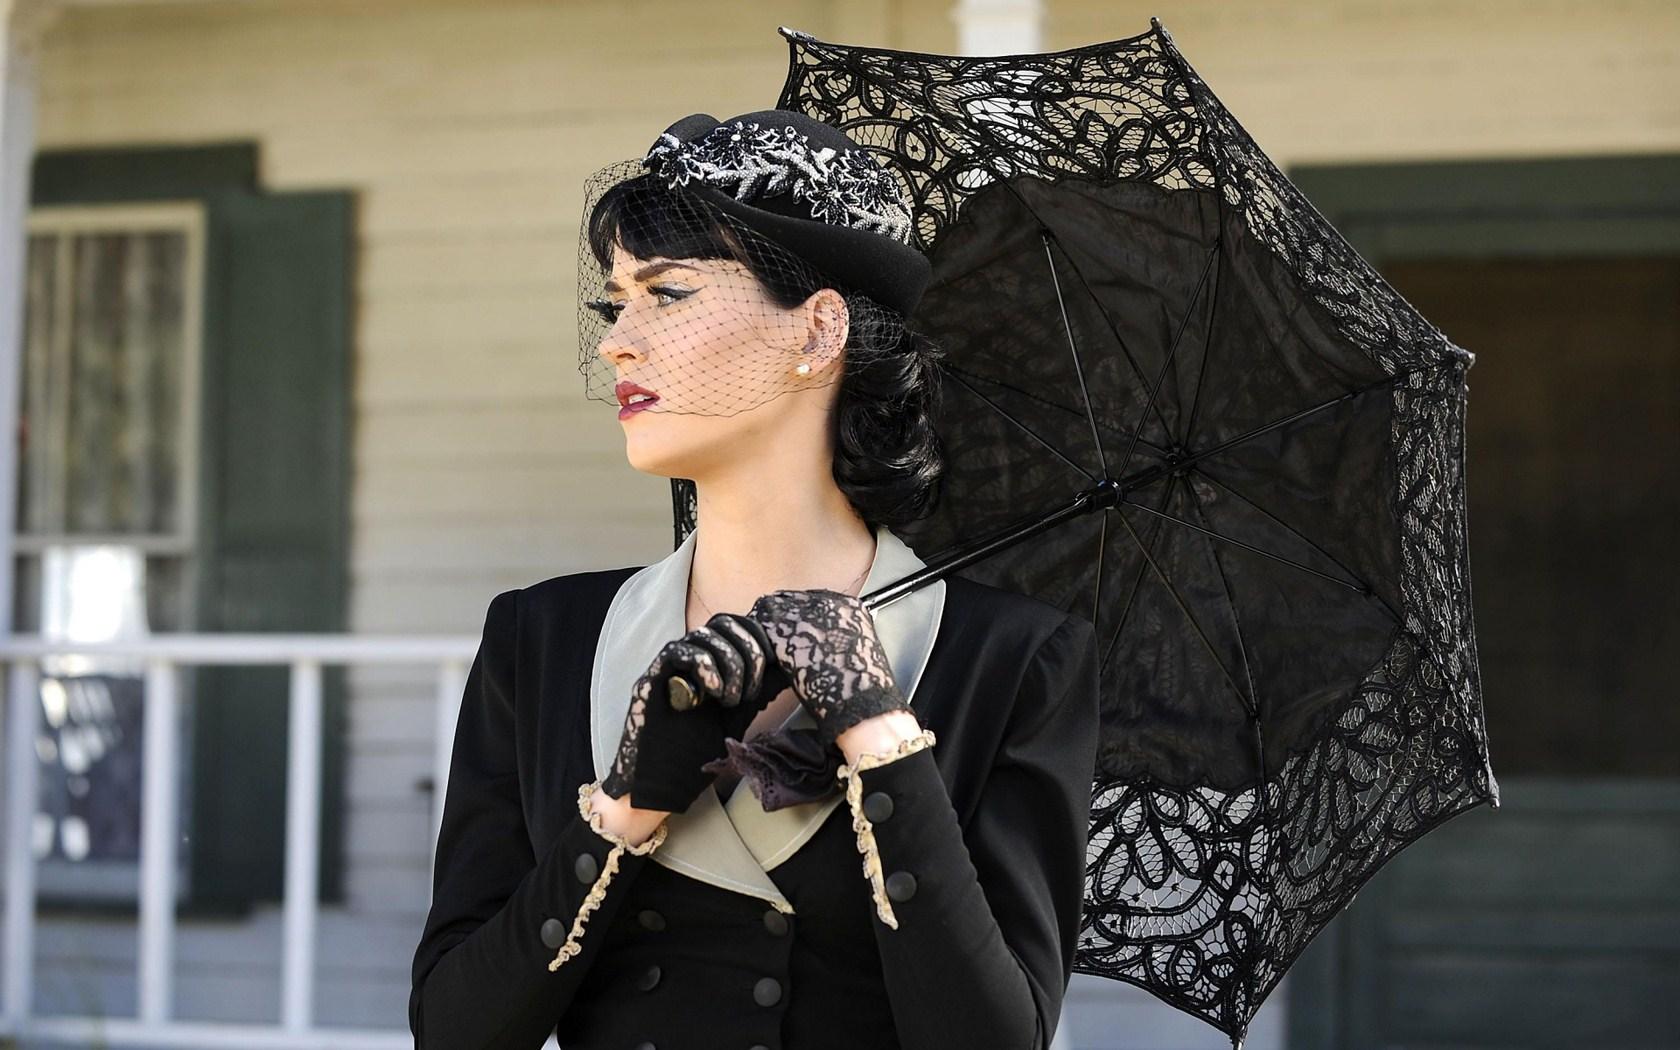 Beautiful Katy Perry Brunette Singer Umbrella HD Wallpaper